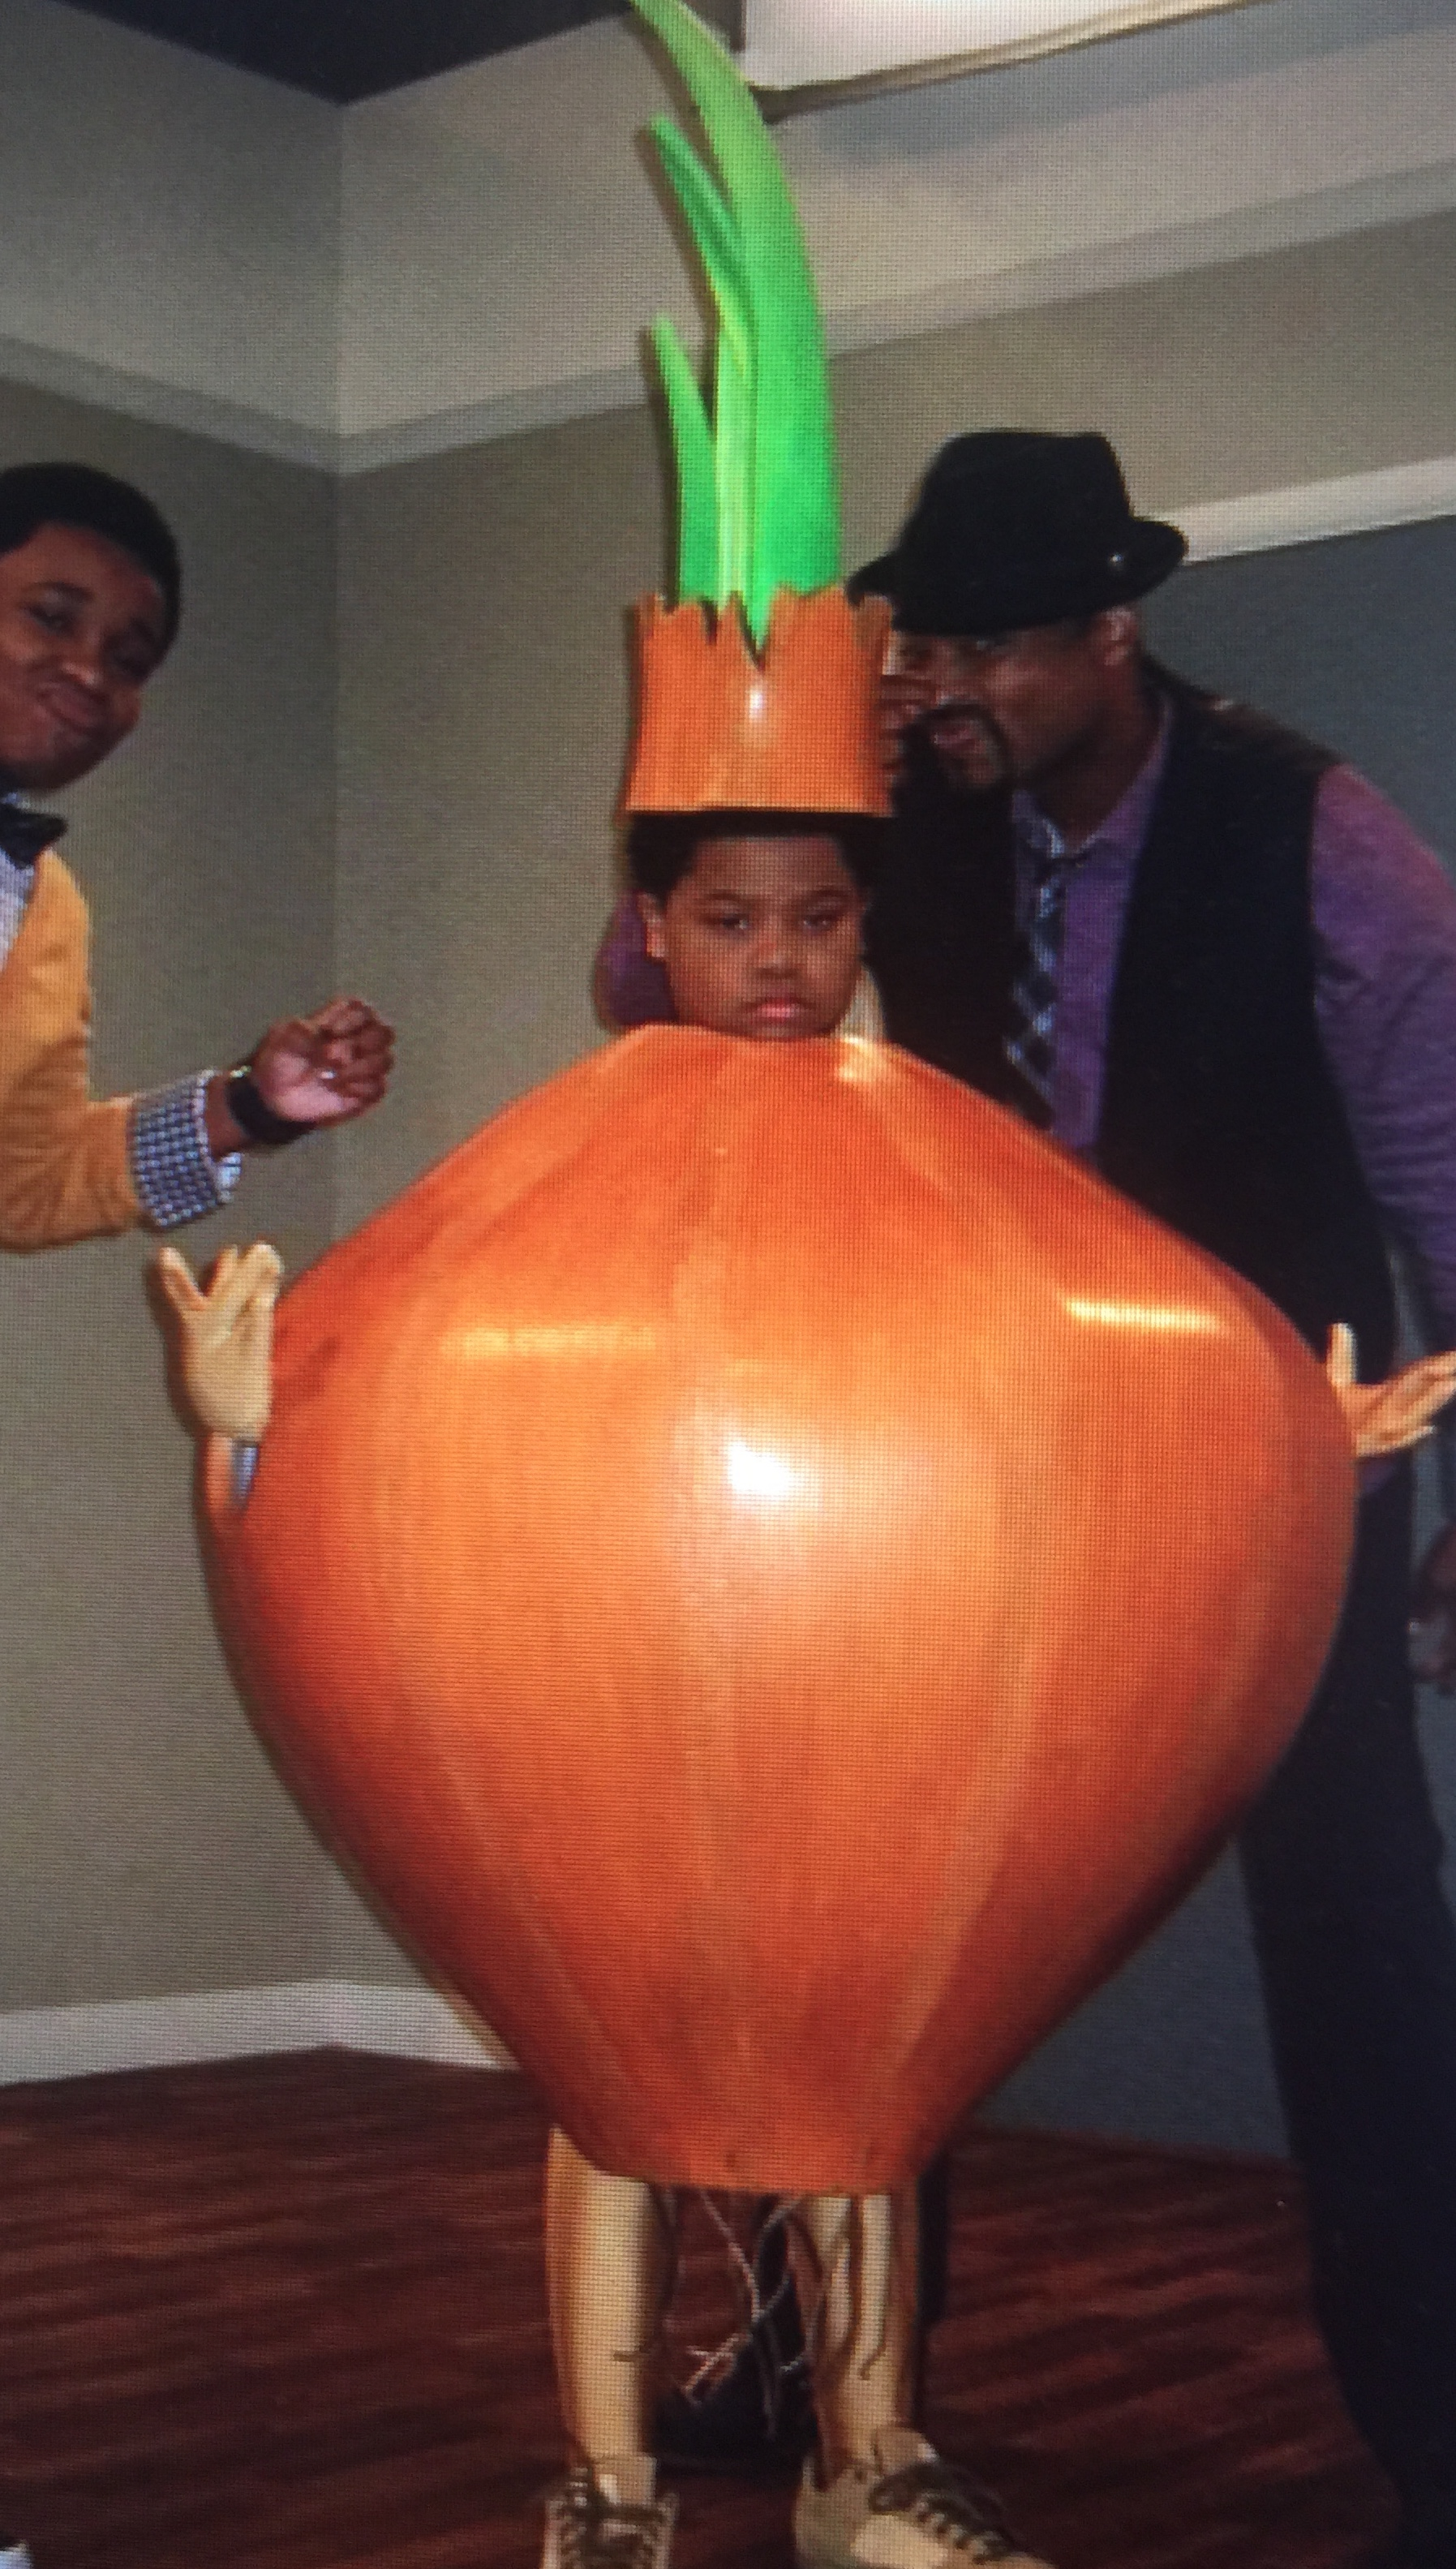 Onion costume